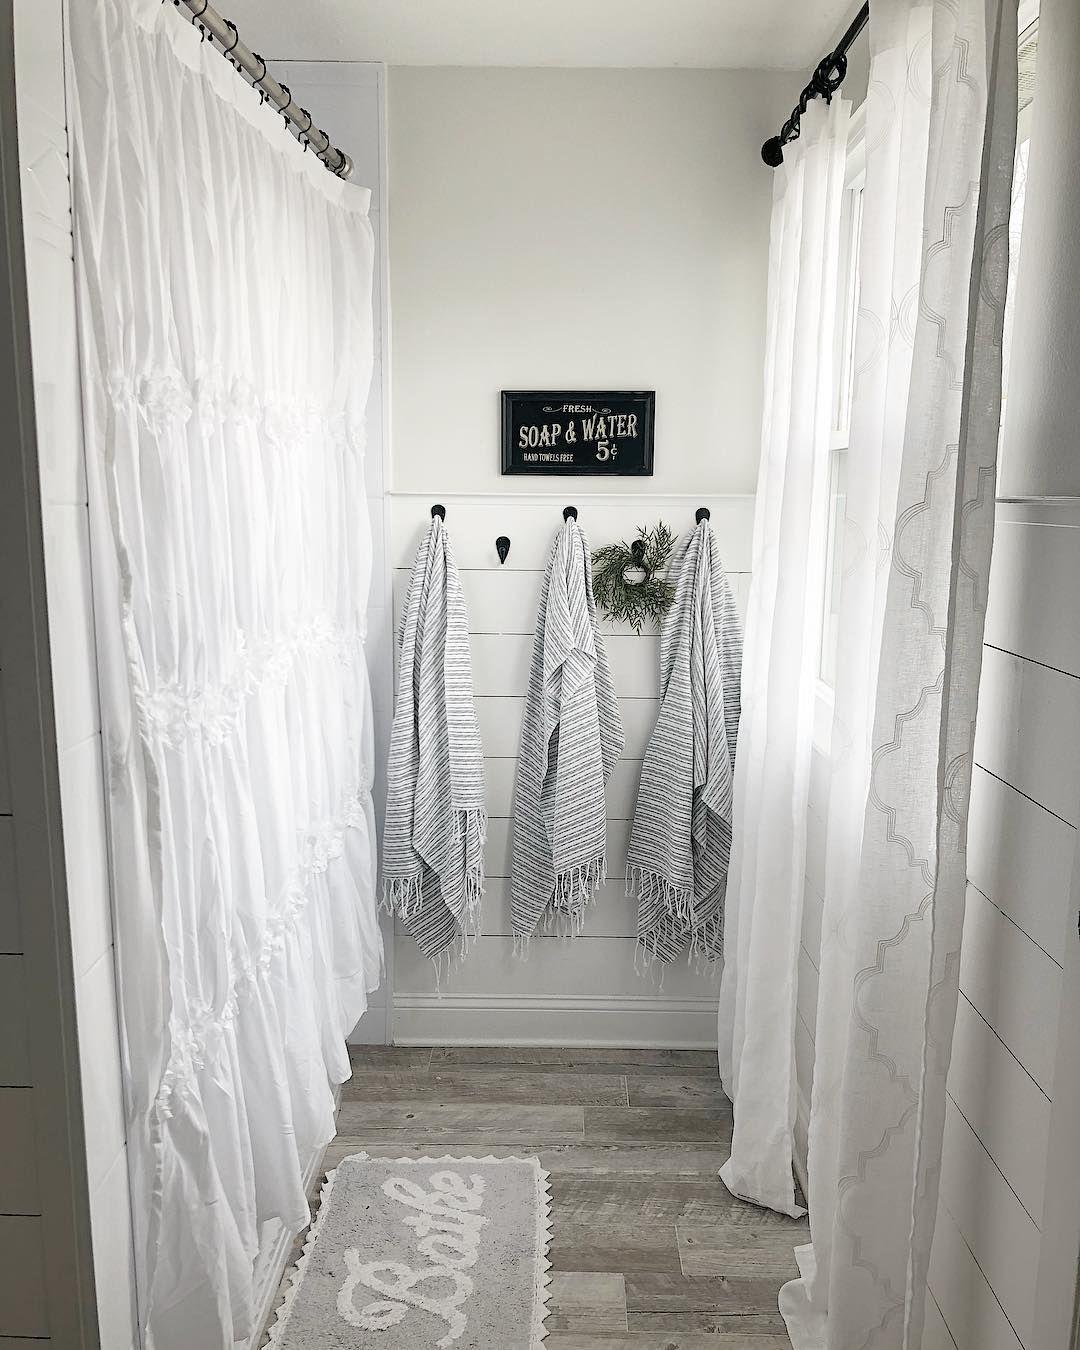 Top 10 Fixer Upper Bathrooms: Pin By Lindsey Walters On Bathroom Updates